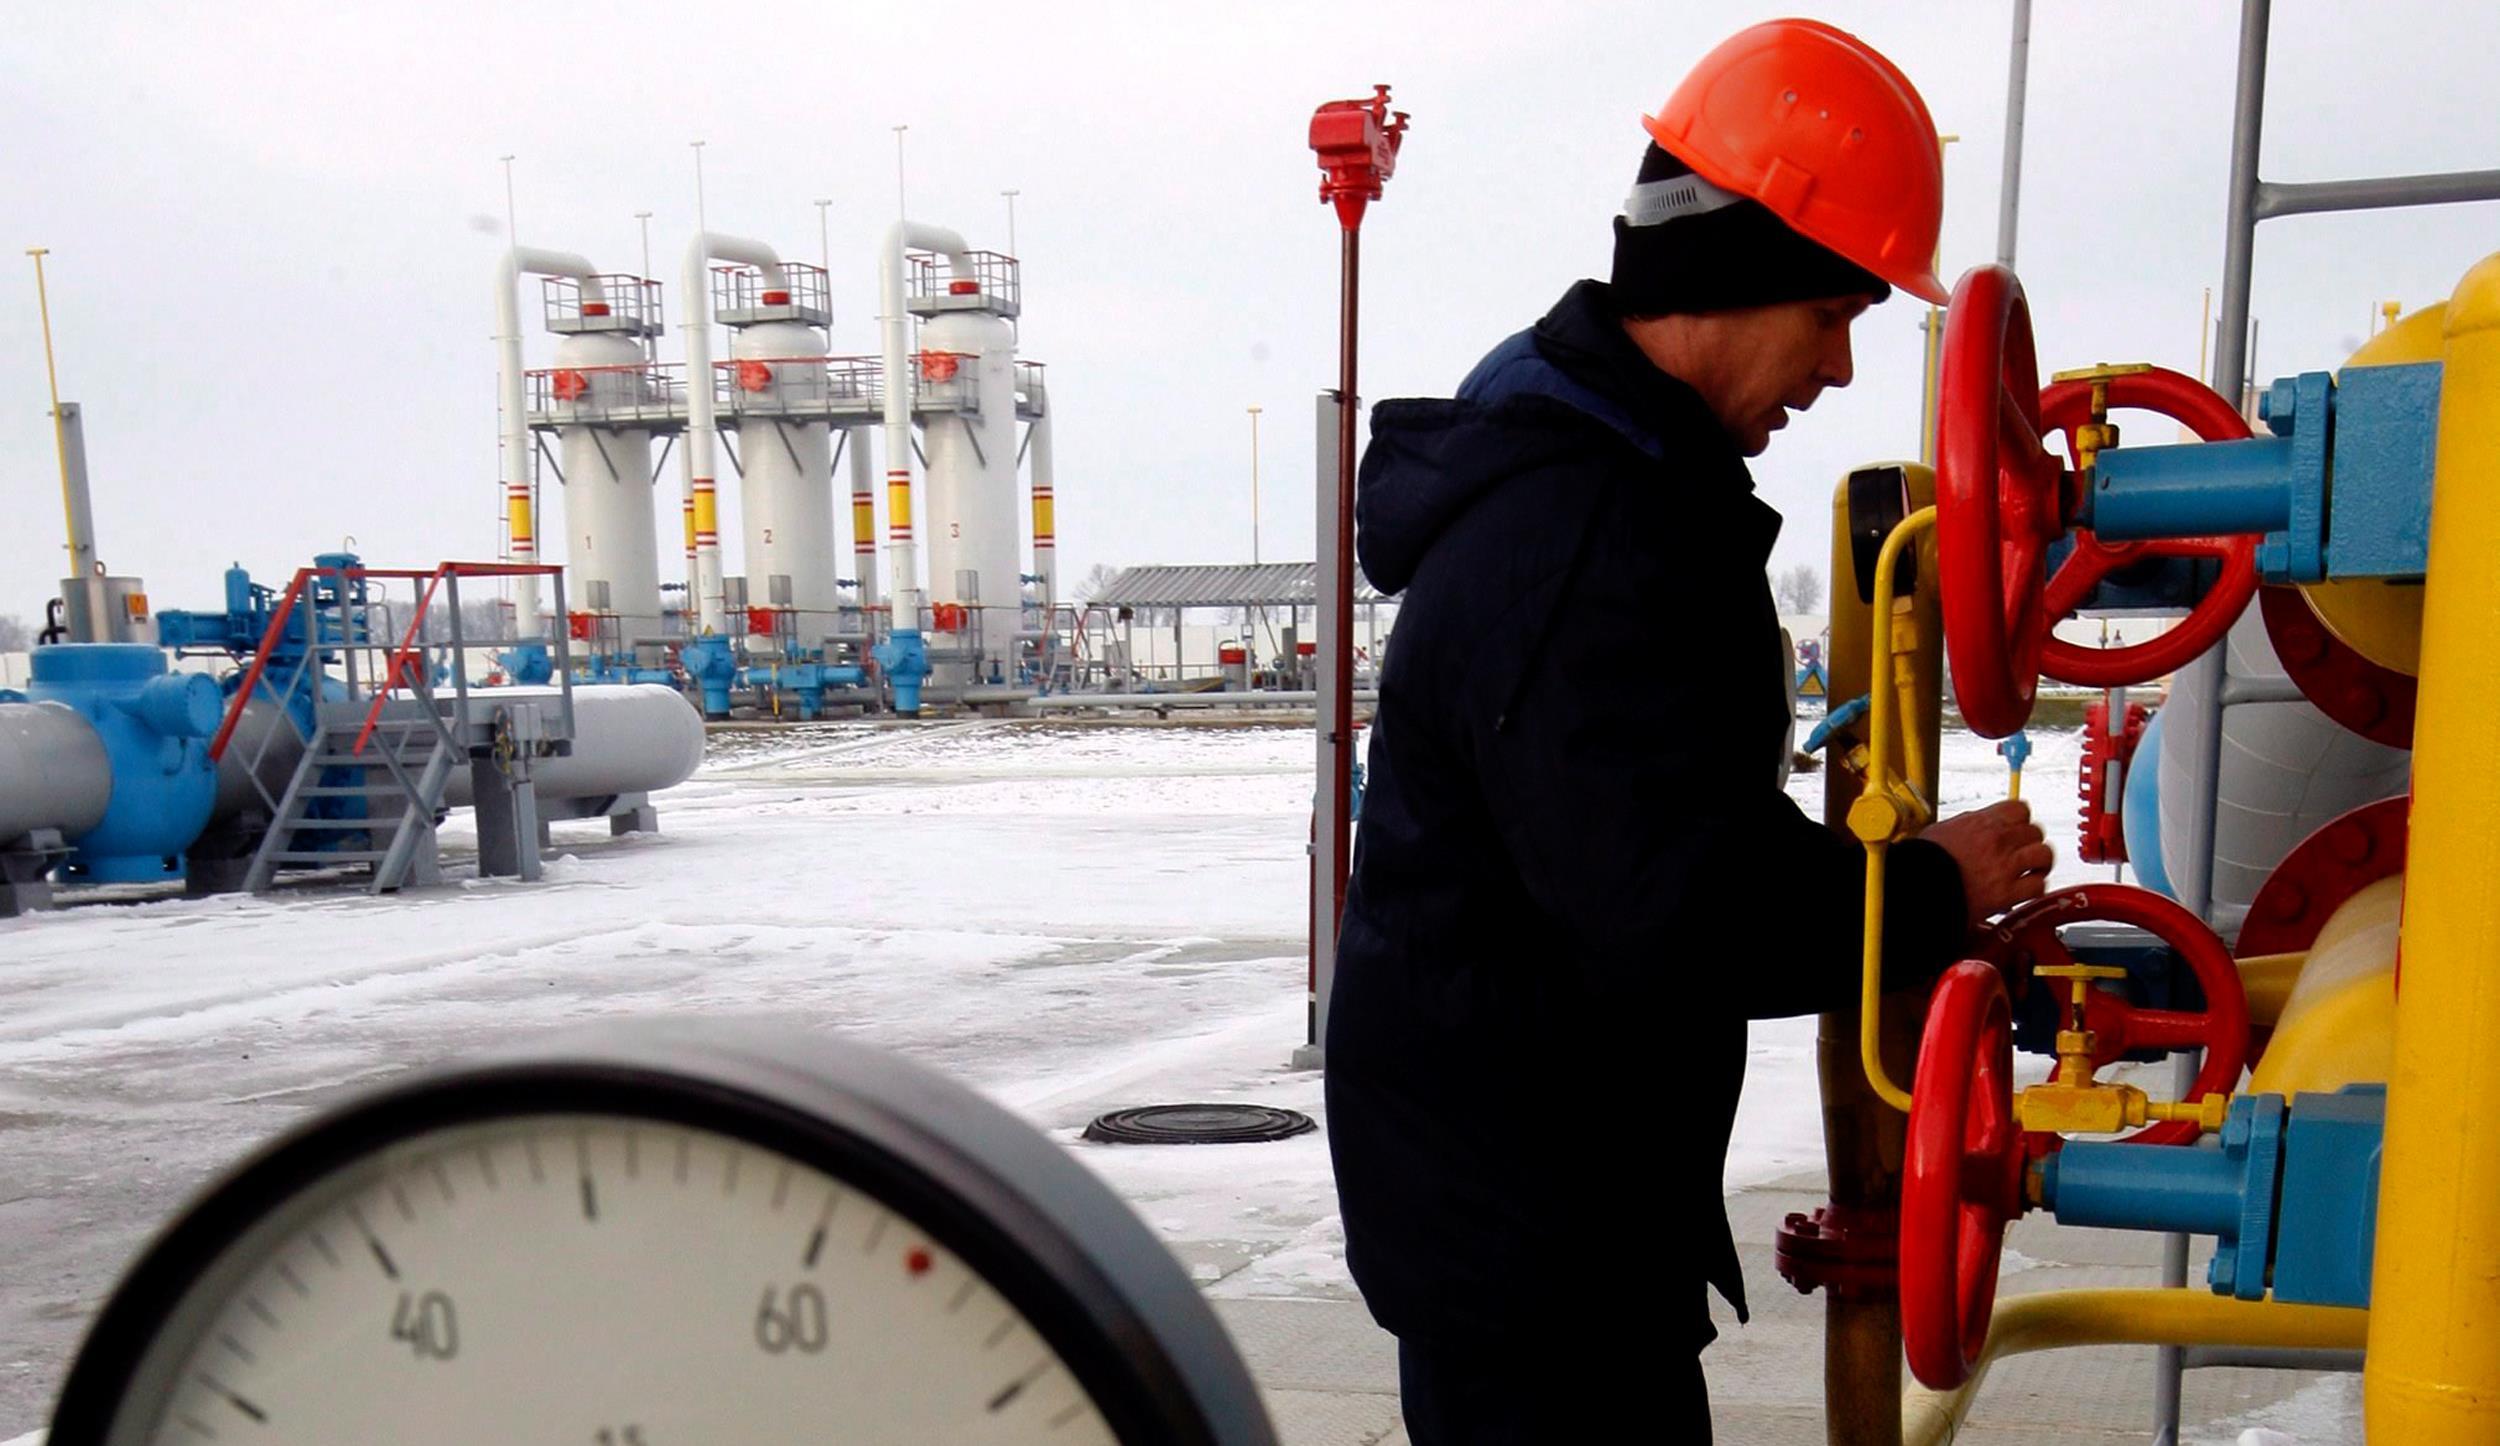 Image: A Ukrainian worker turns off a tap at the new gas-compressor station 'Bobrovnytska' in Mryn village